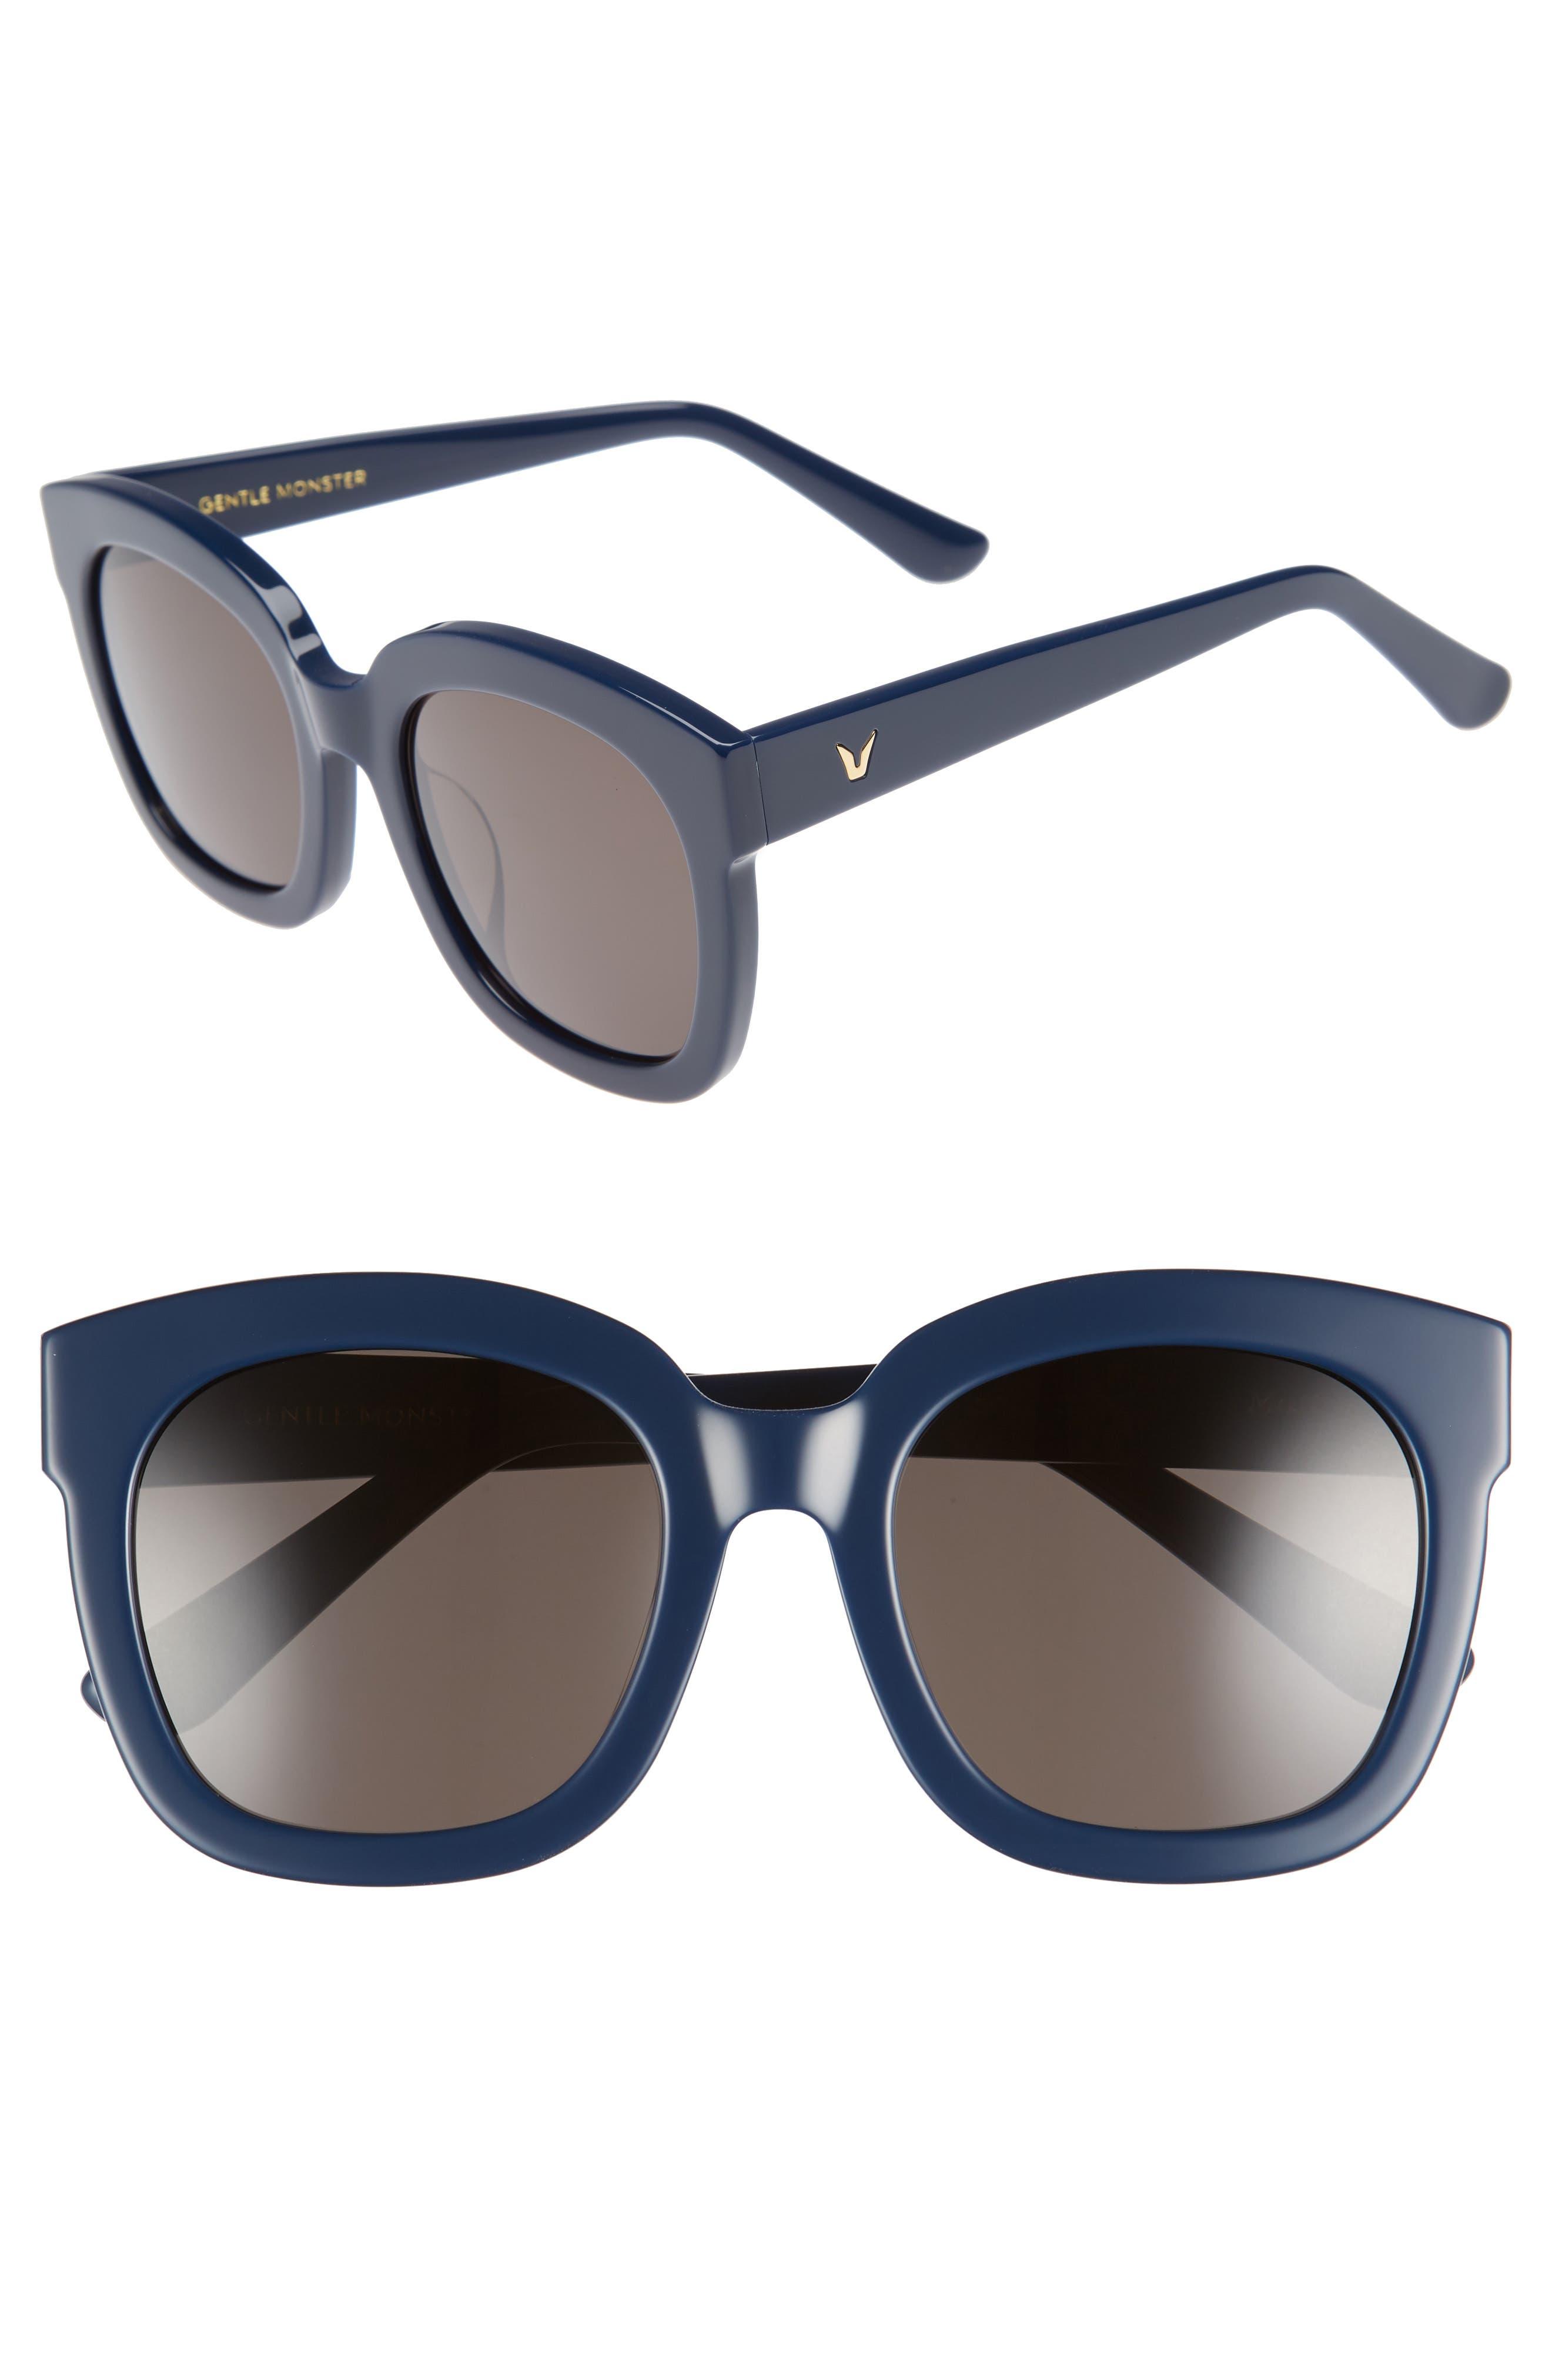 Main Image - Gentle Monster Matti 51mm Rounded Sunglasses